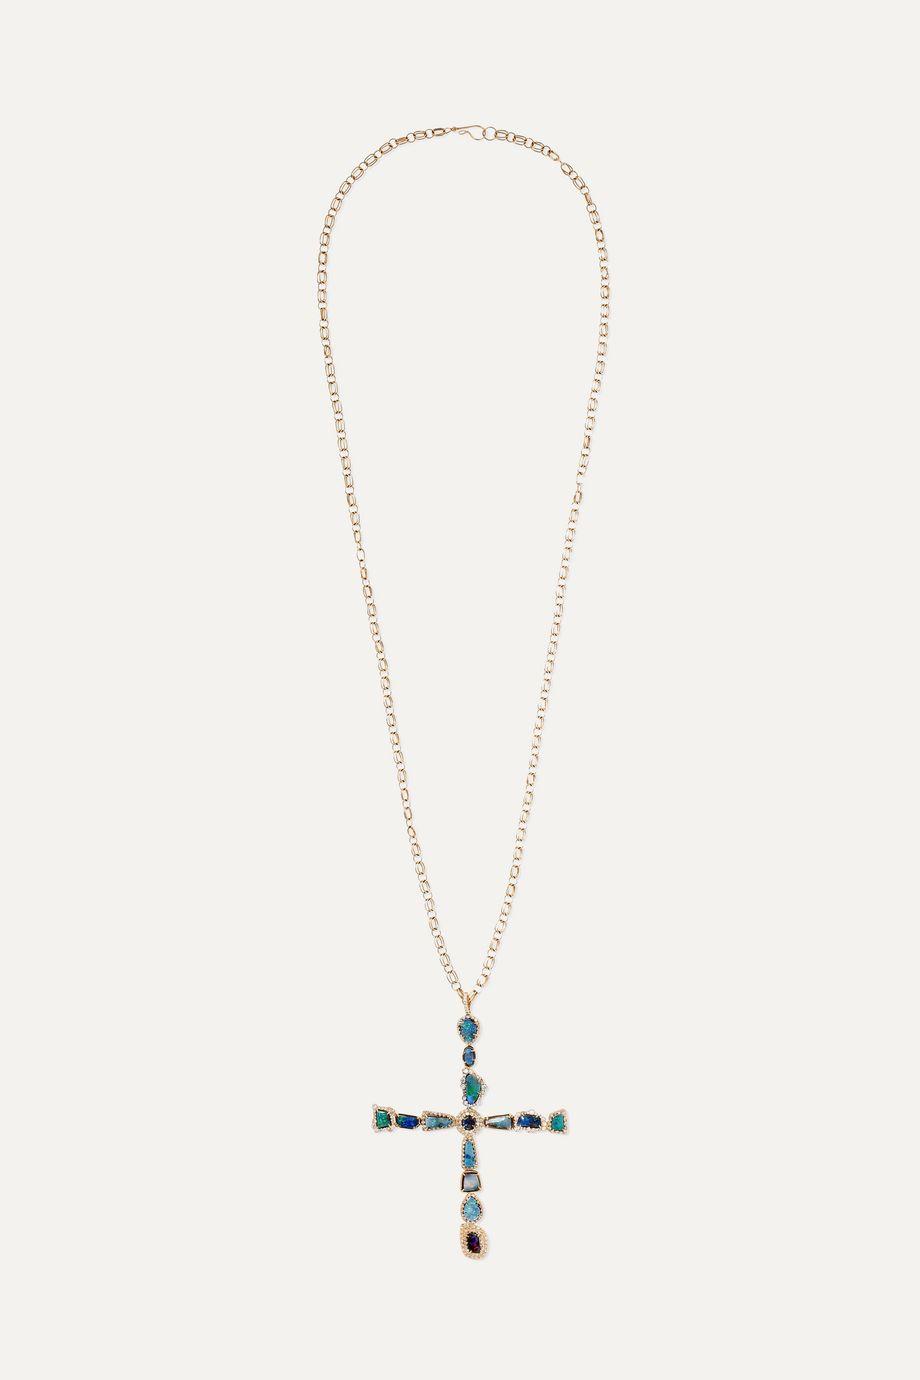 Kimberly McDonald + NET SUSTAIN 18-karat rose gold, opal and diamond necklace